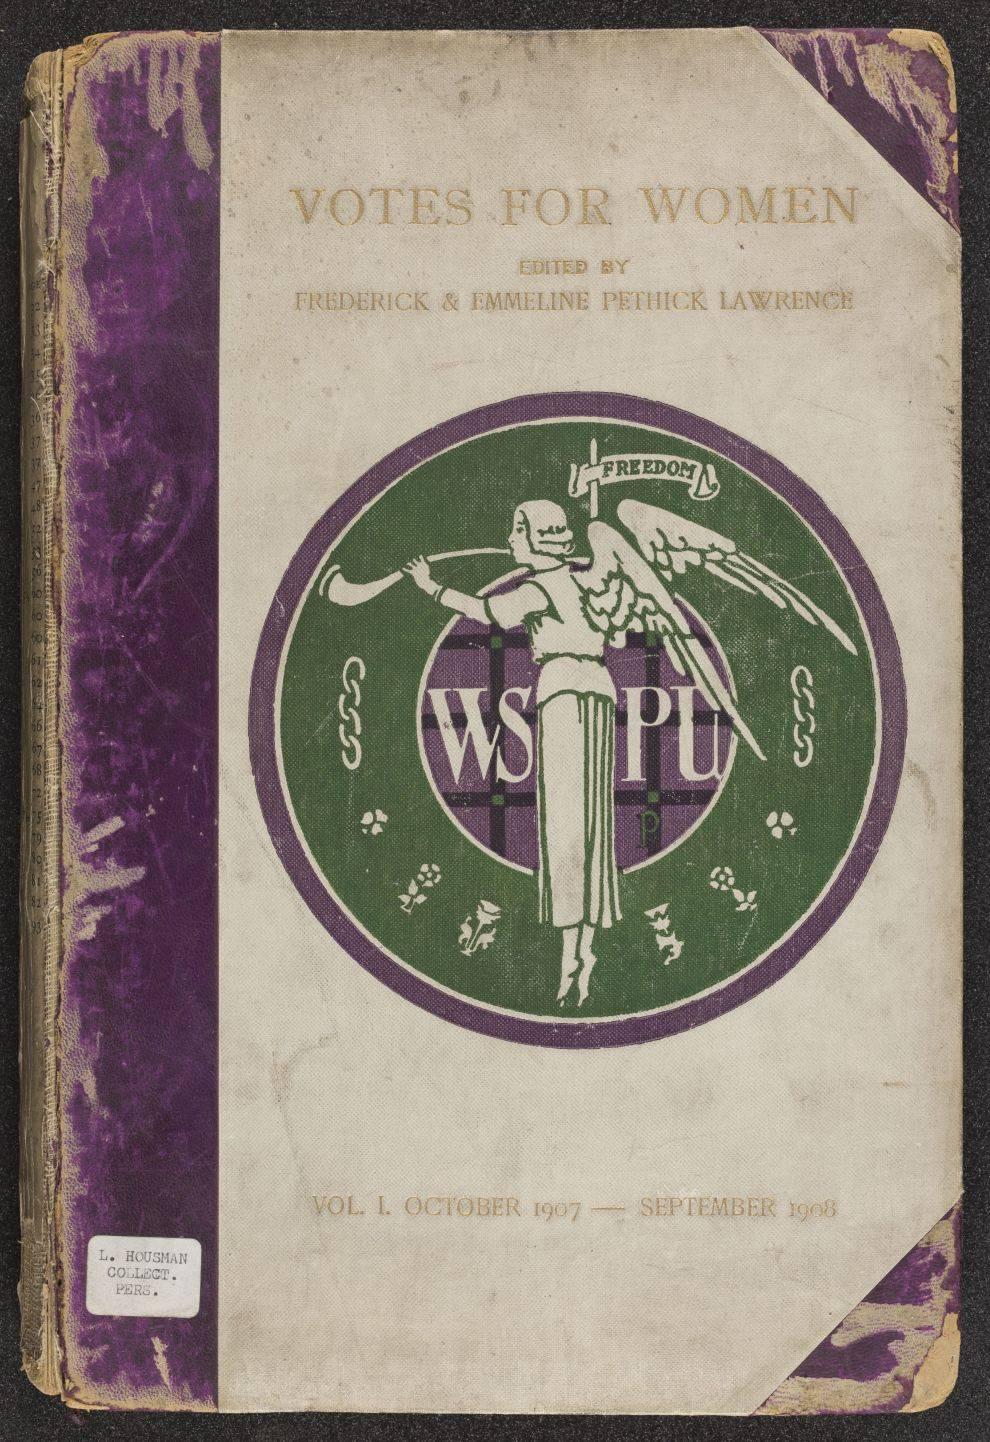 Votes for women Vol 1 (Oct 1907 - Sept 1908)